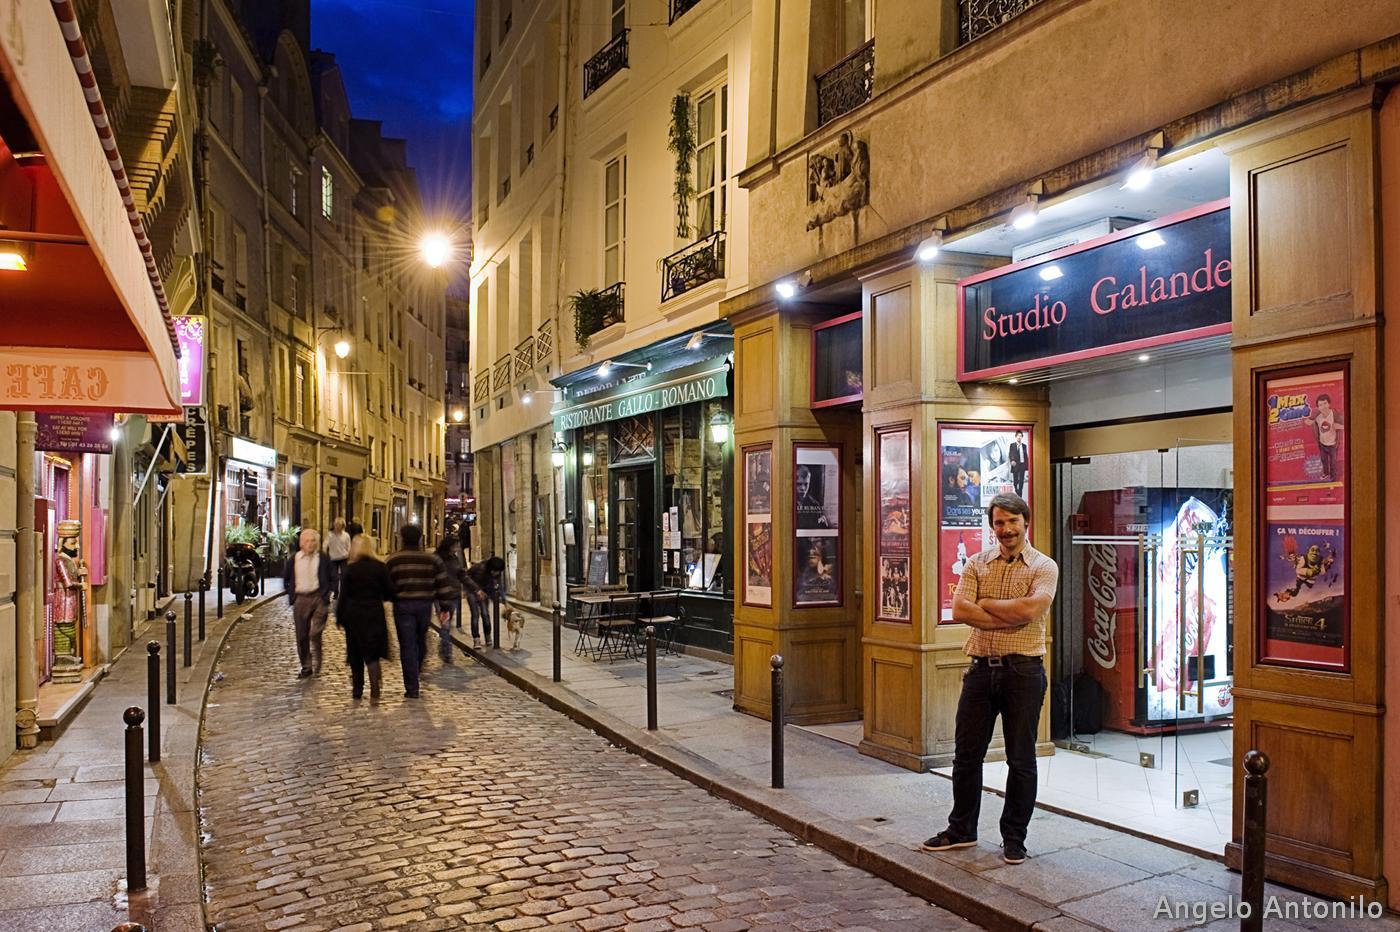 Cinema Studio Galande 224 Paris 75005 75